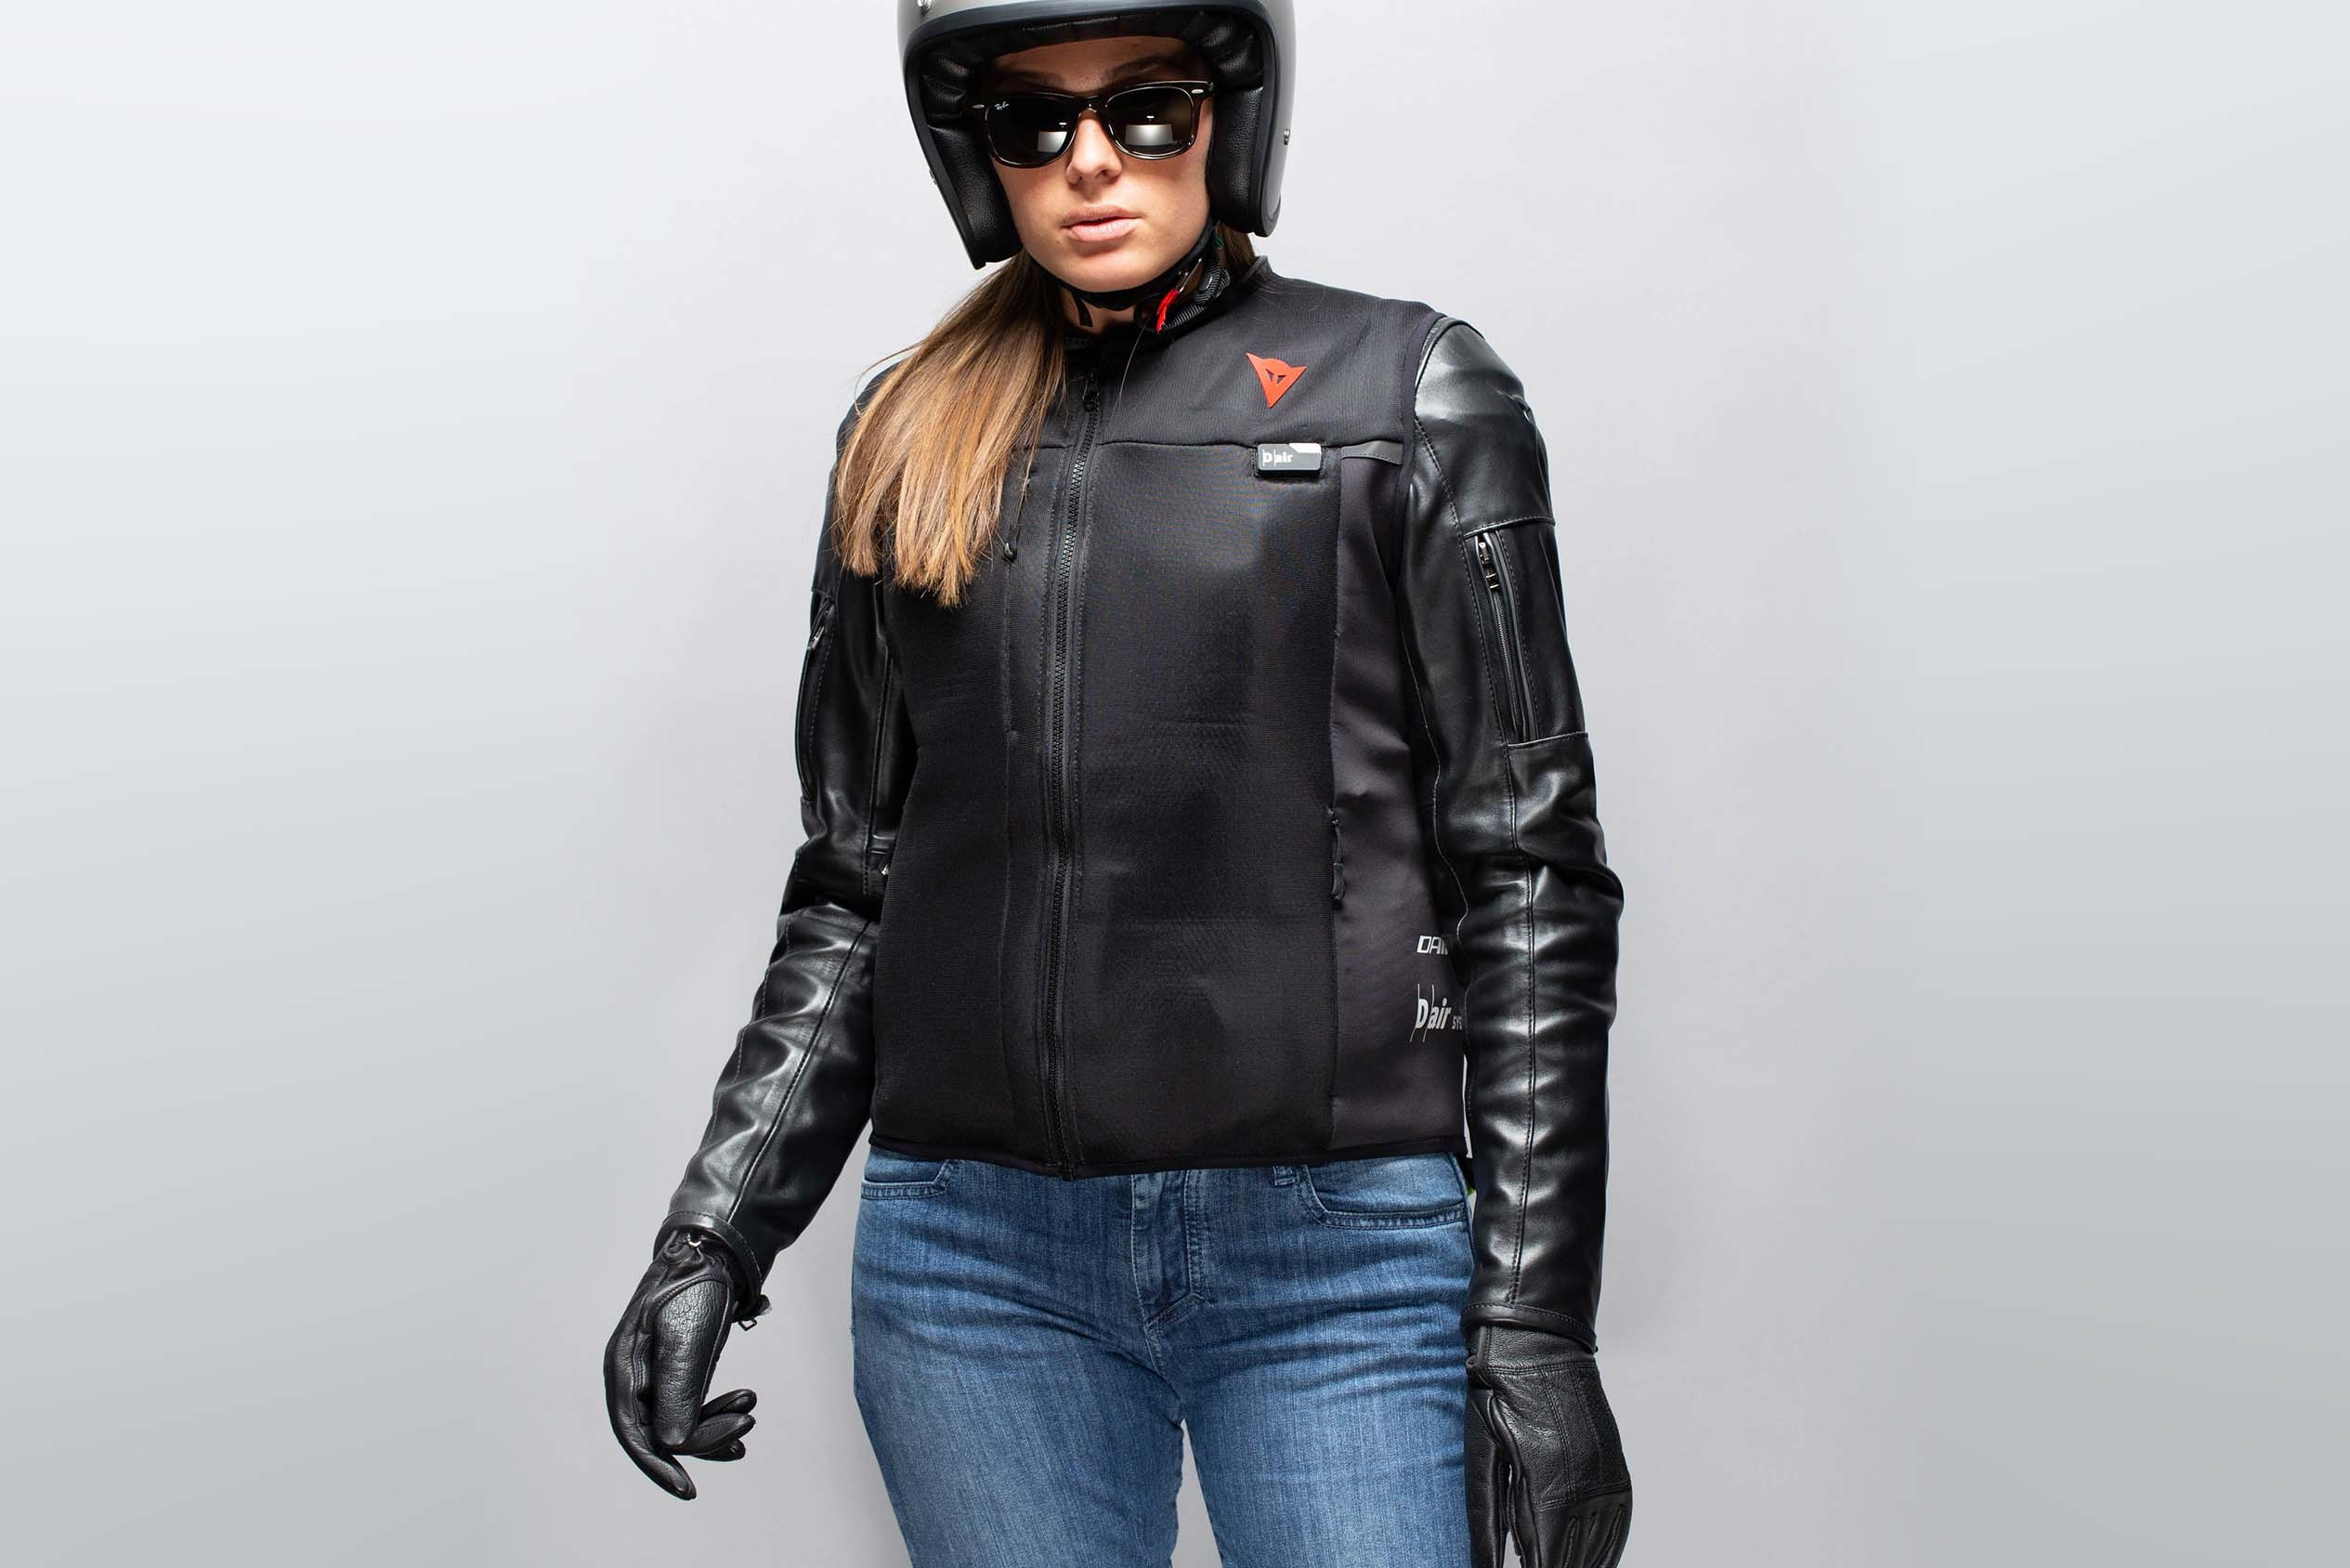 Dainese-Smart-Jacket-airbag-10